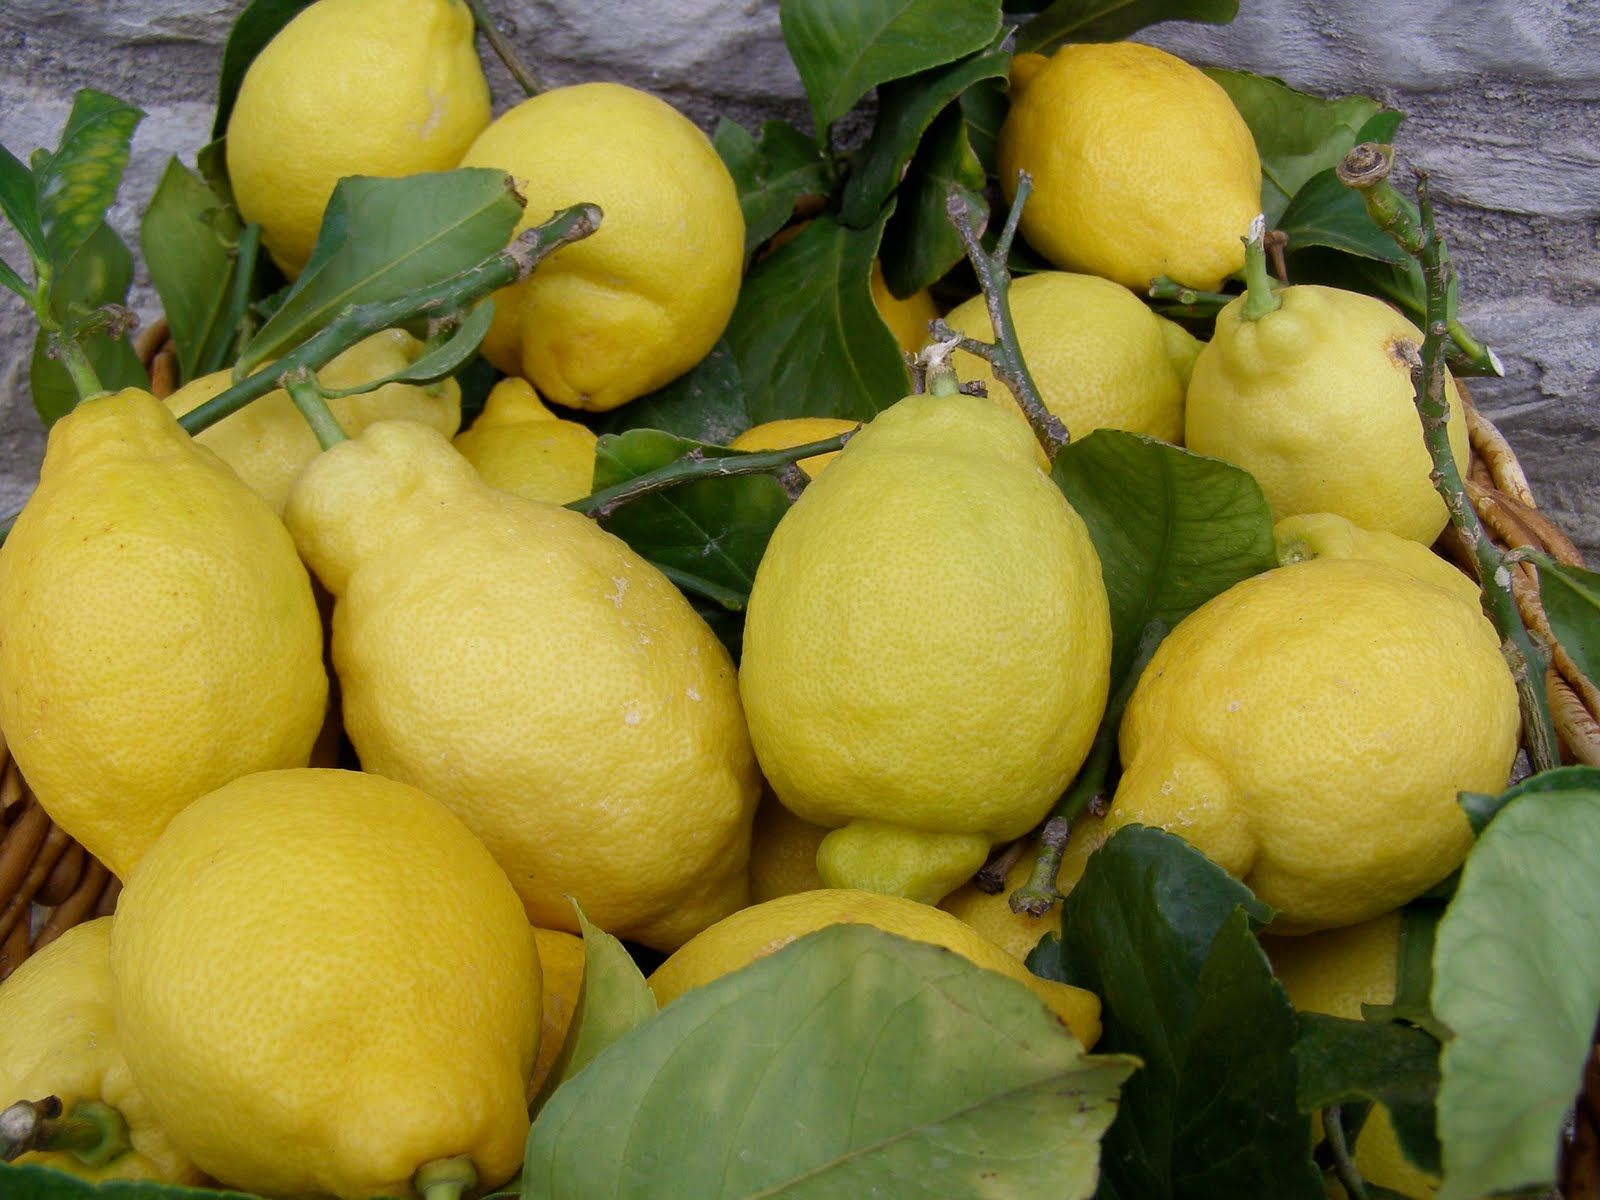 La Tavola Marche: Homemade Limoncello - A Refreshing Buzz